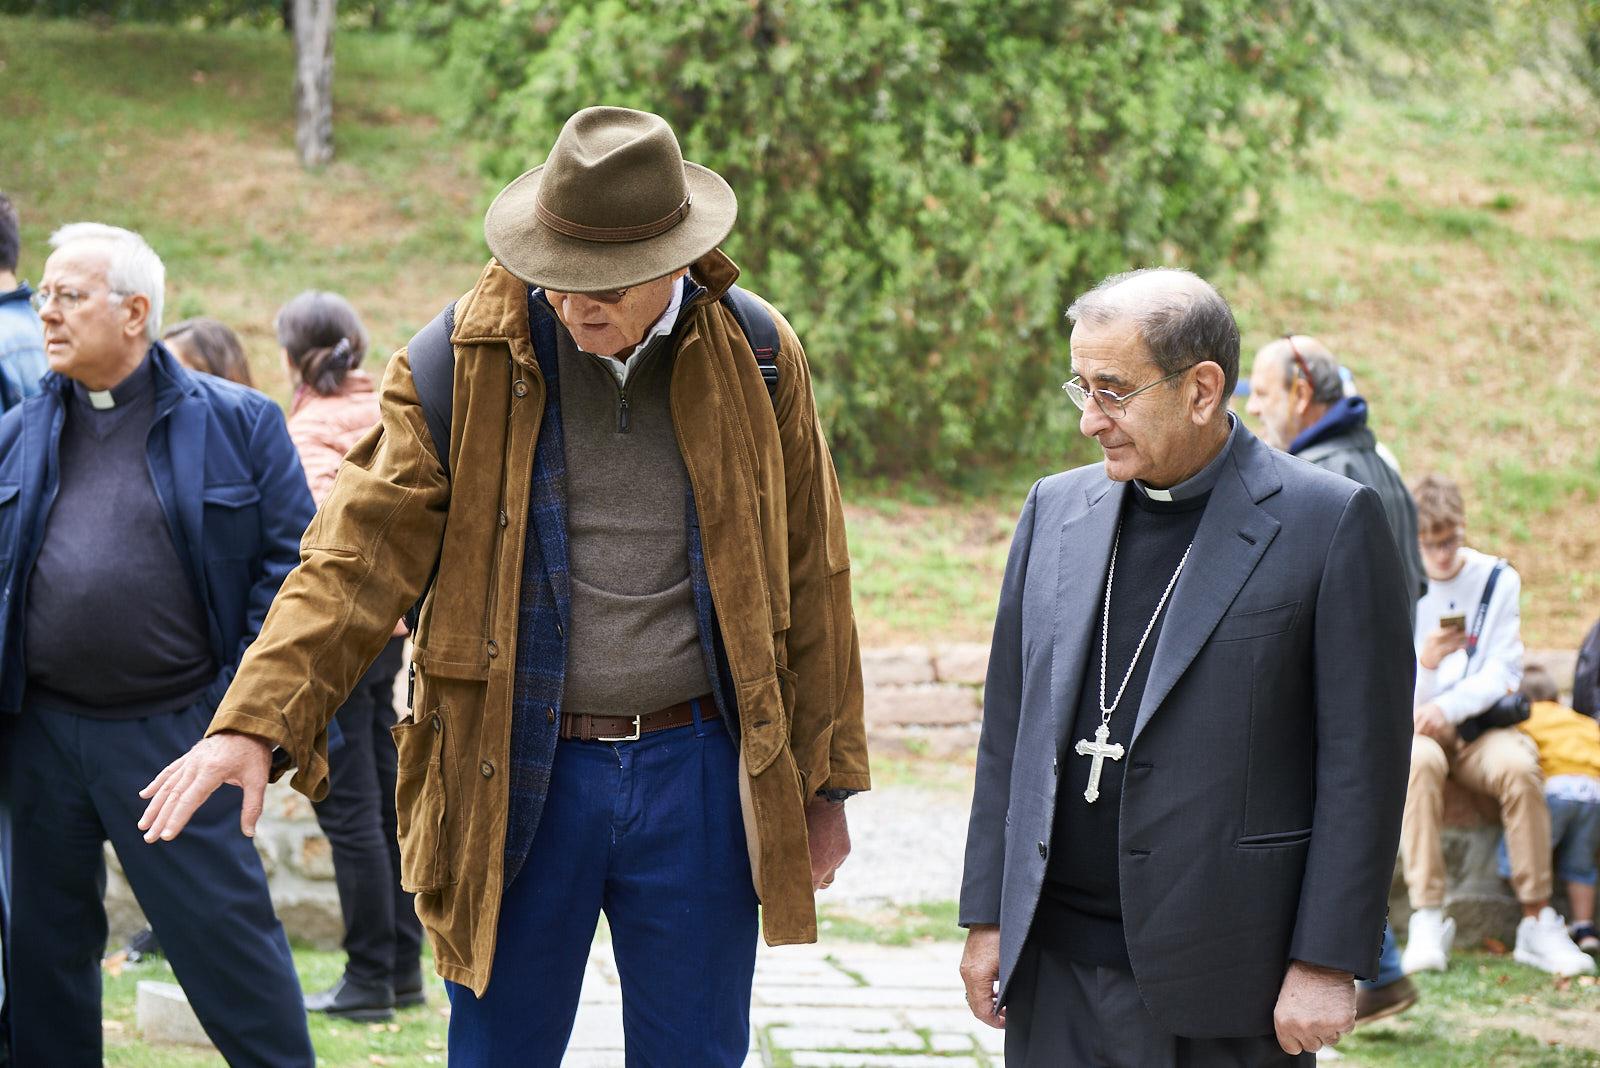 Monsignor Mario Delpini, archbishop of Milan with Gabriele Nissim, president of Gariwo